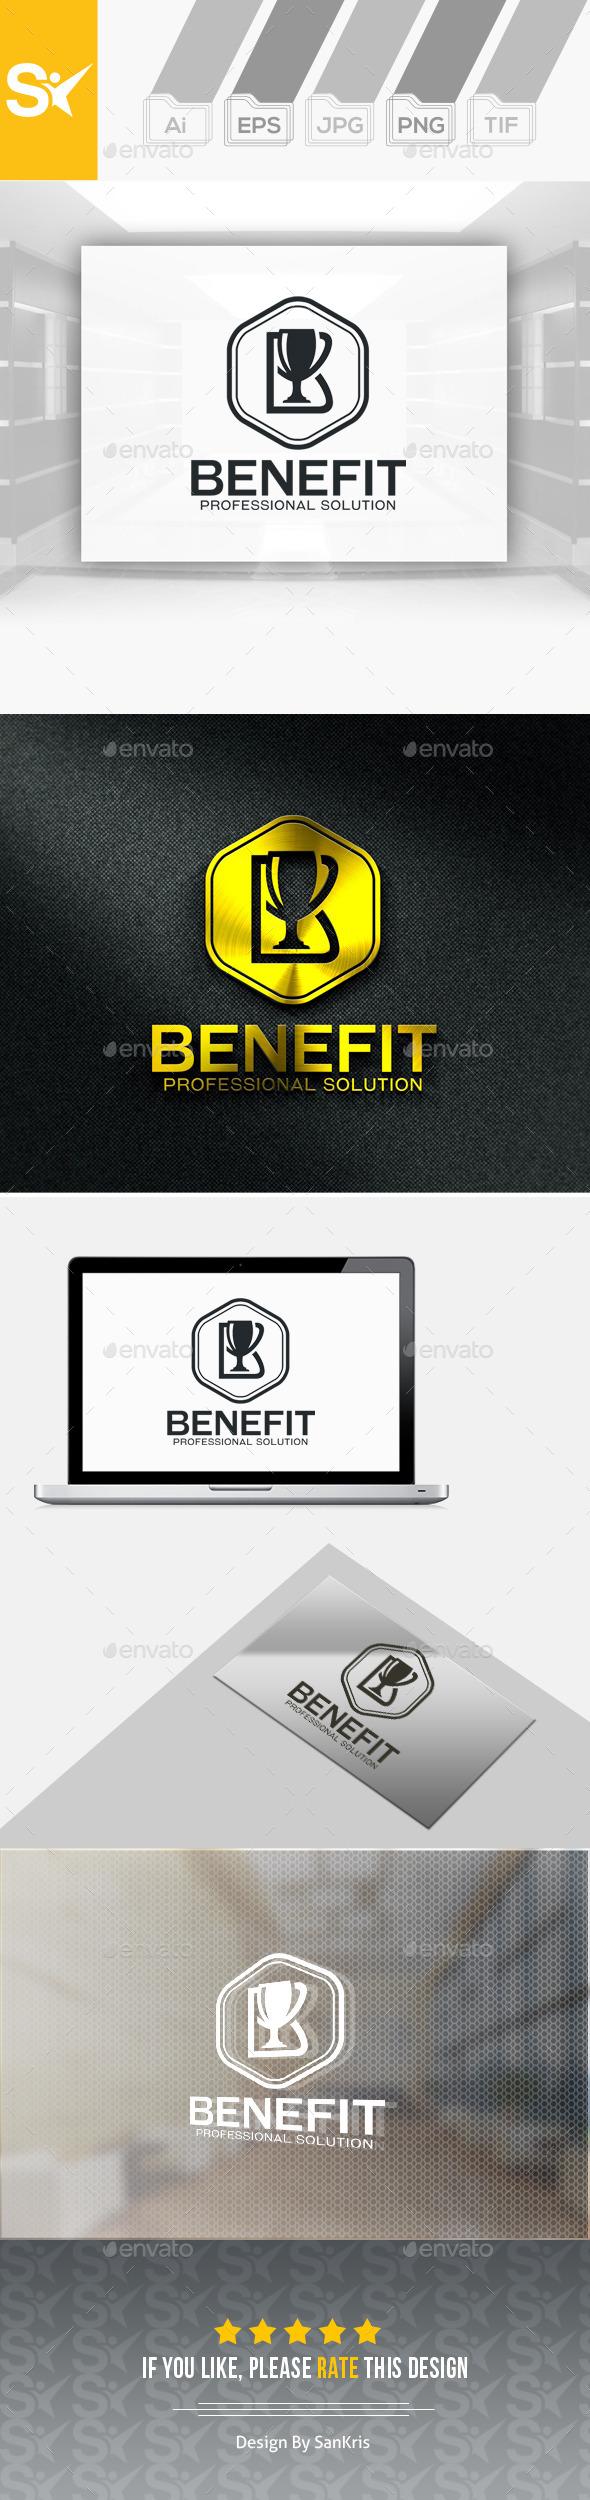 Benefit Pro Logo | B letter